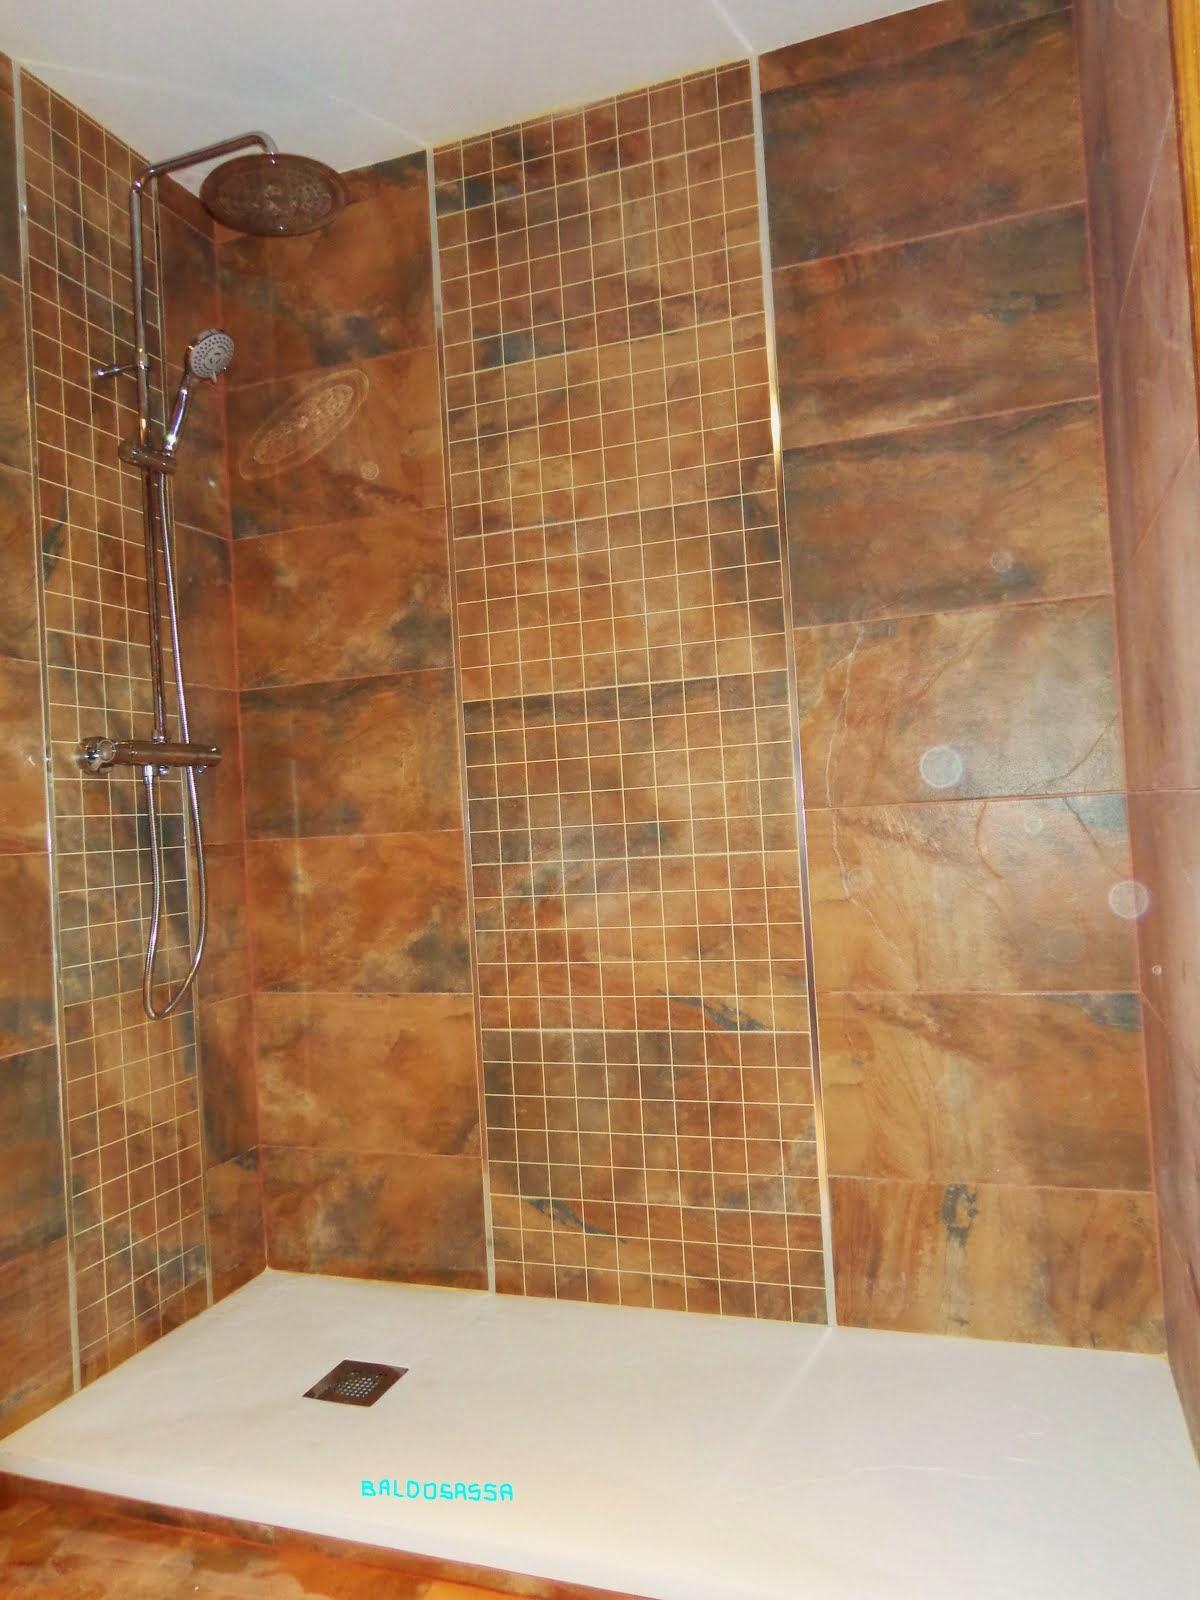 Baldosassa fotos e imagenes de platos de ducha - Precio baldosas bano ...